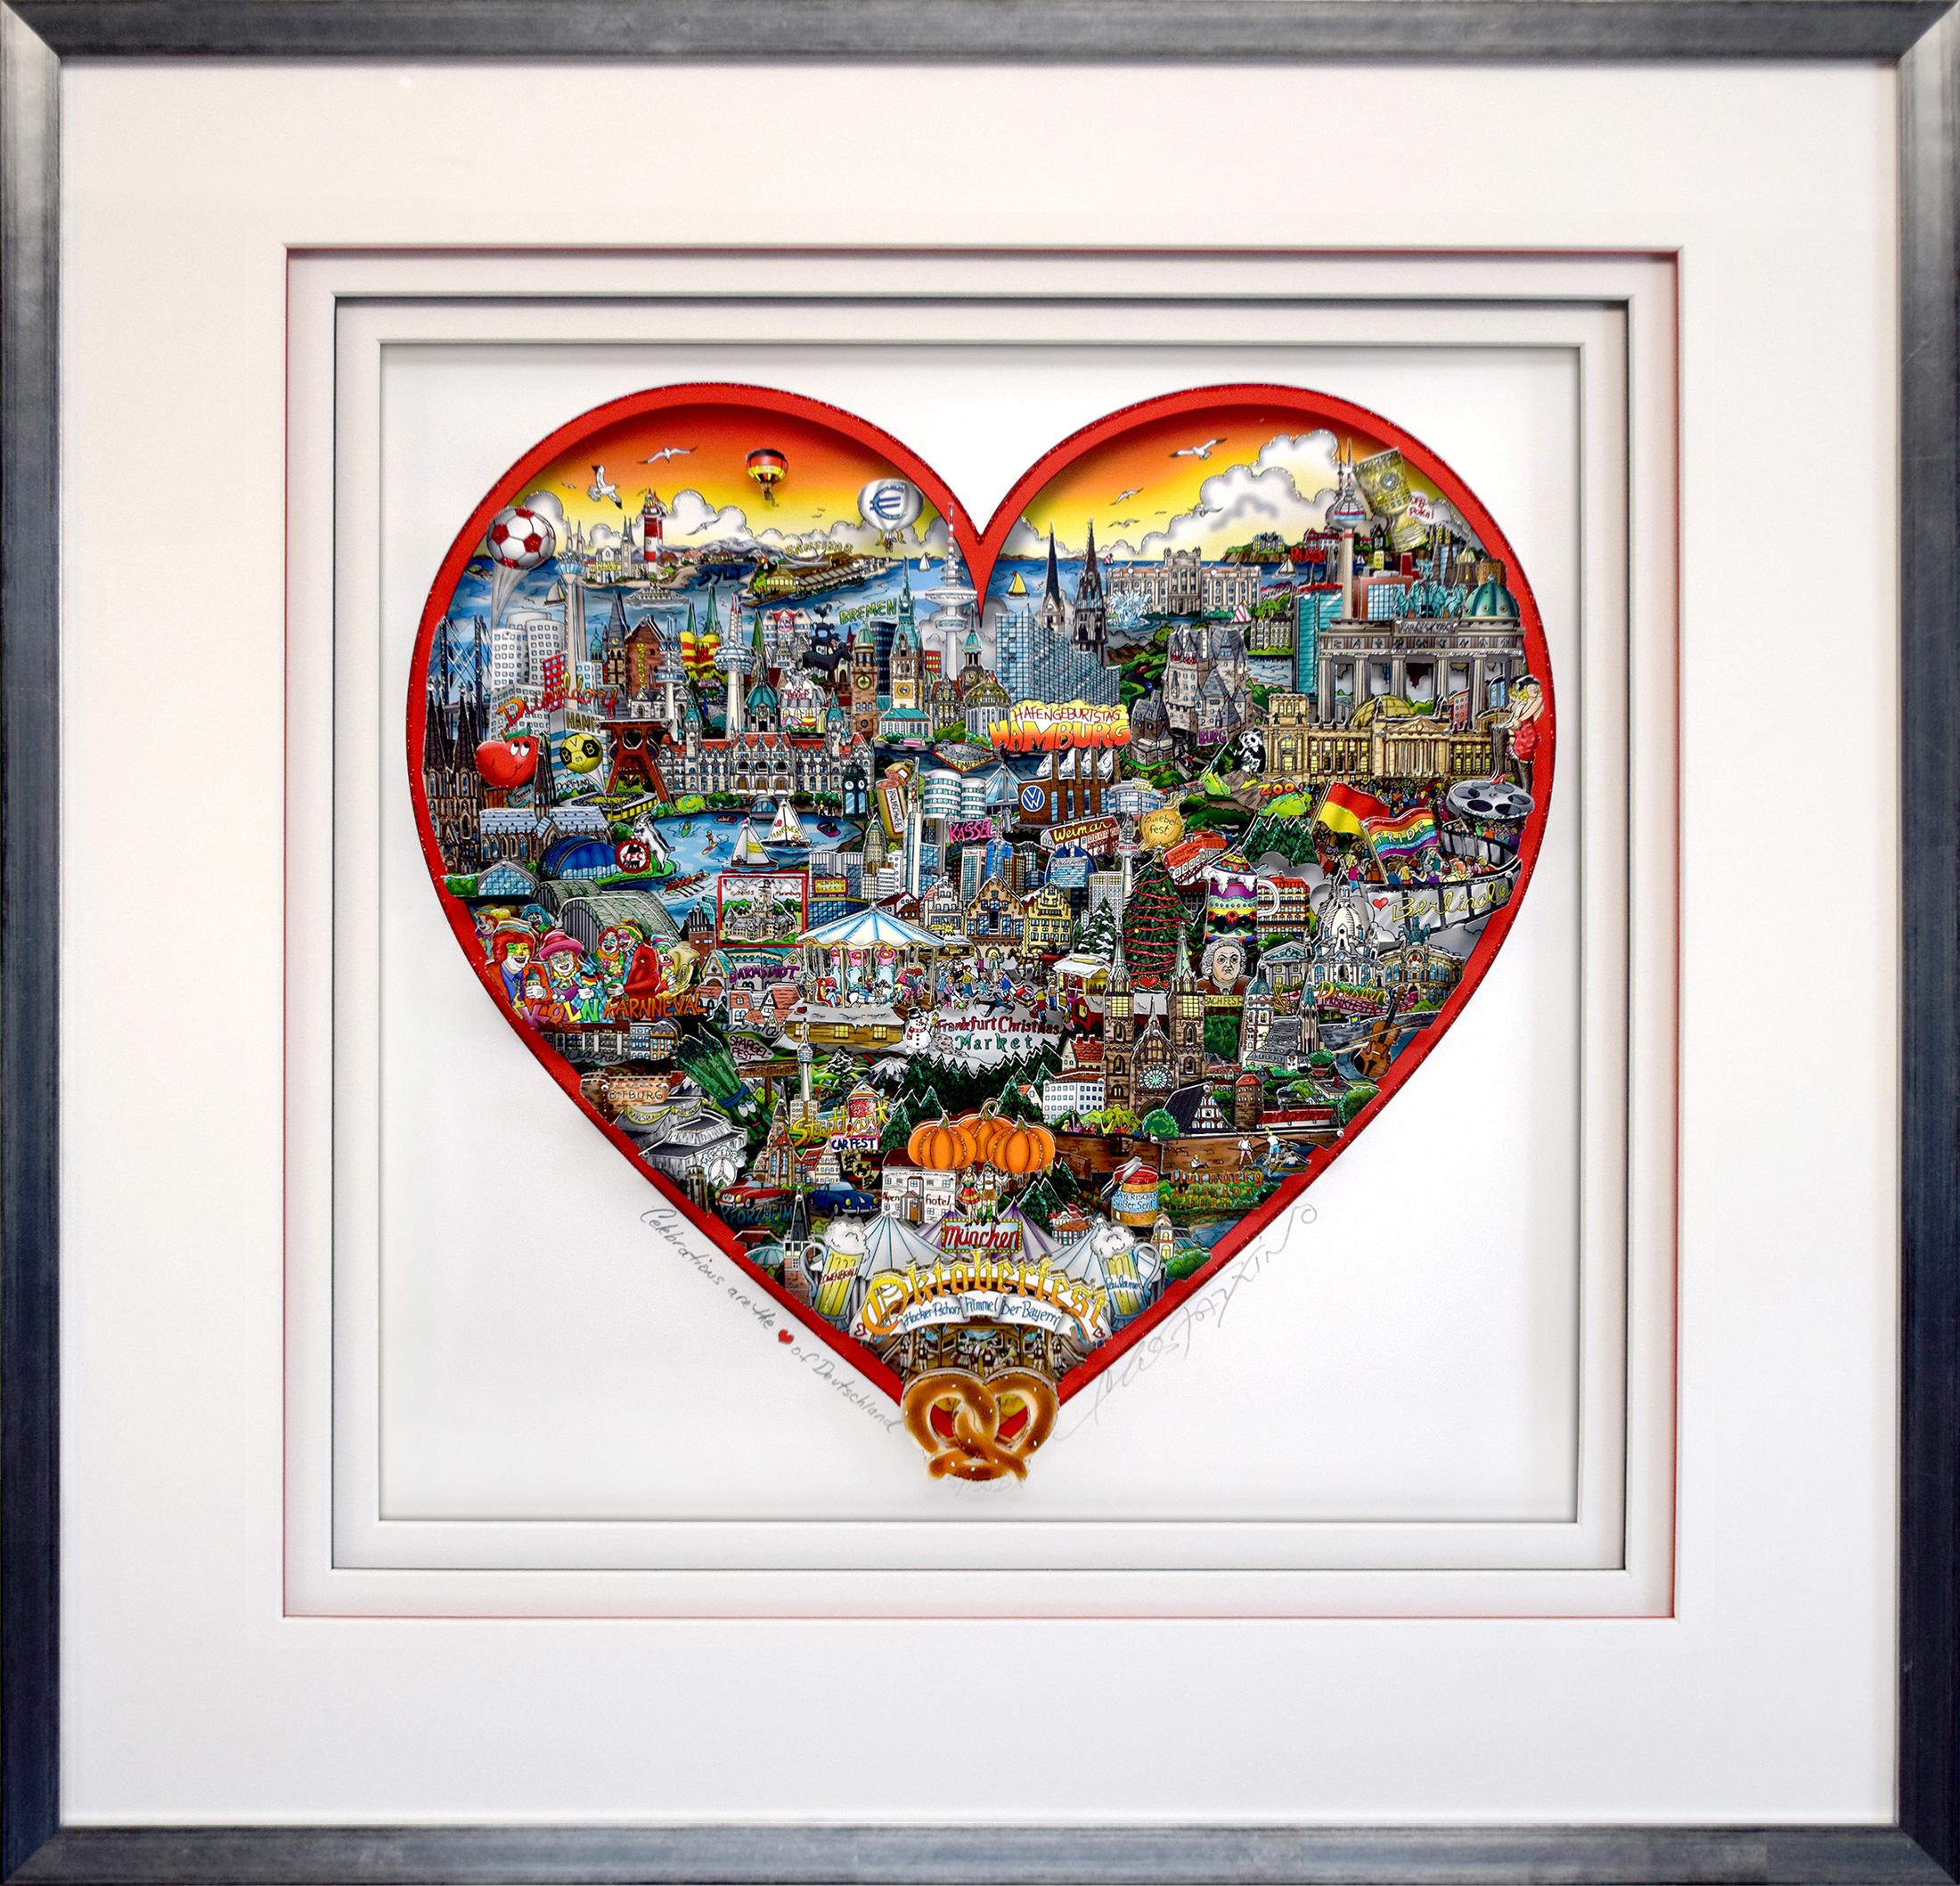 Charles Fazzino - Celebrations are the Heart of Deutschland , 5553-008-360-368-375